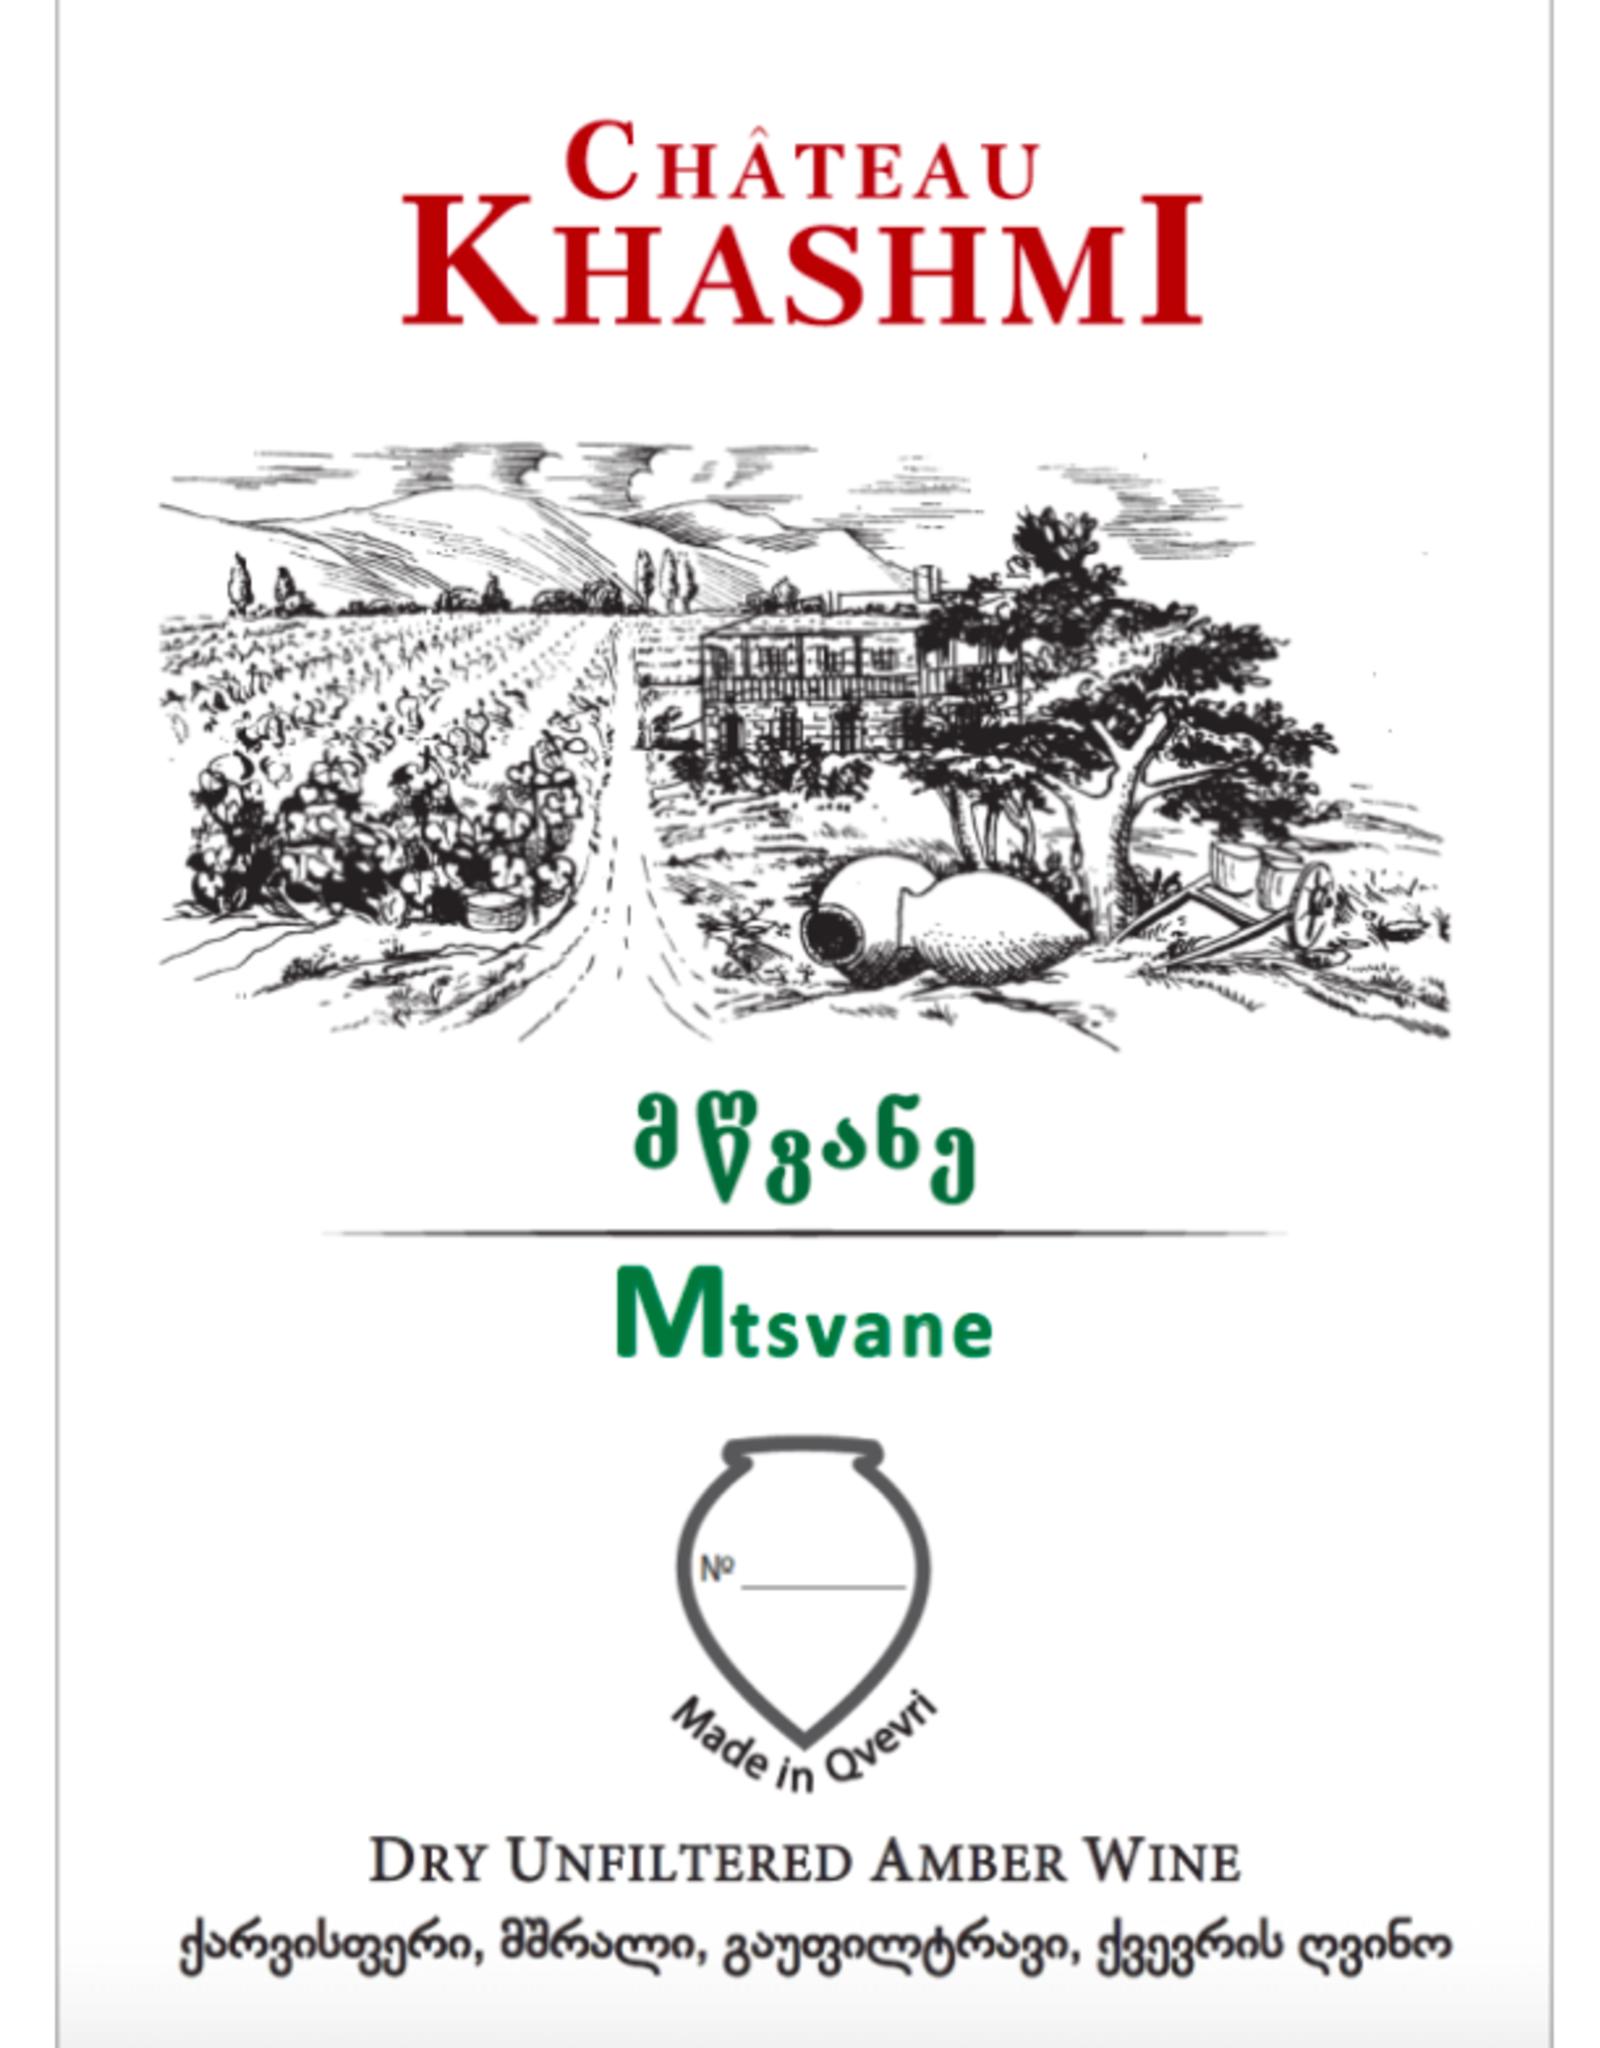 New Item Chateau Khashmi Mtsvane Amber 2017